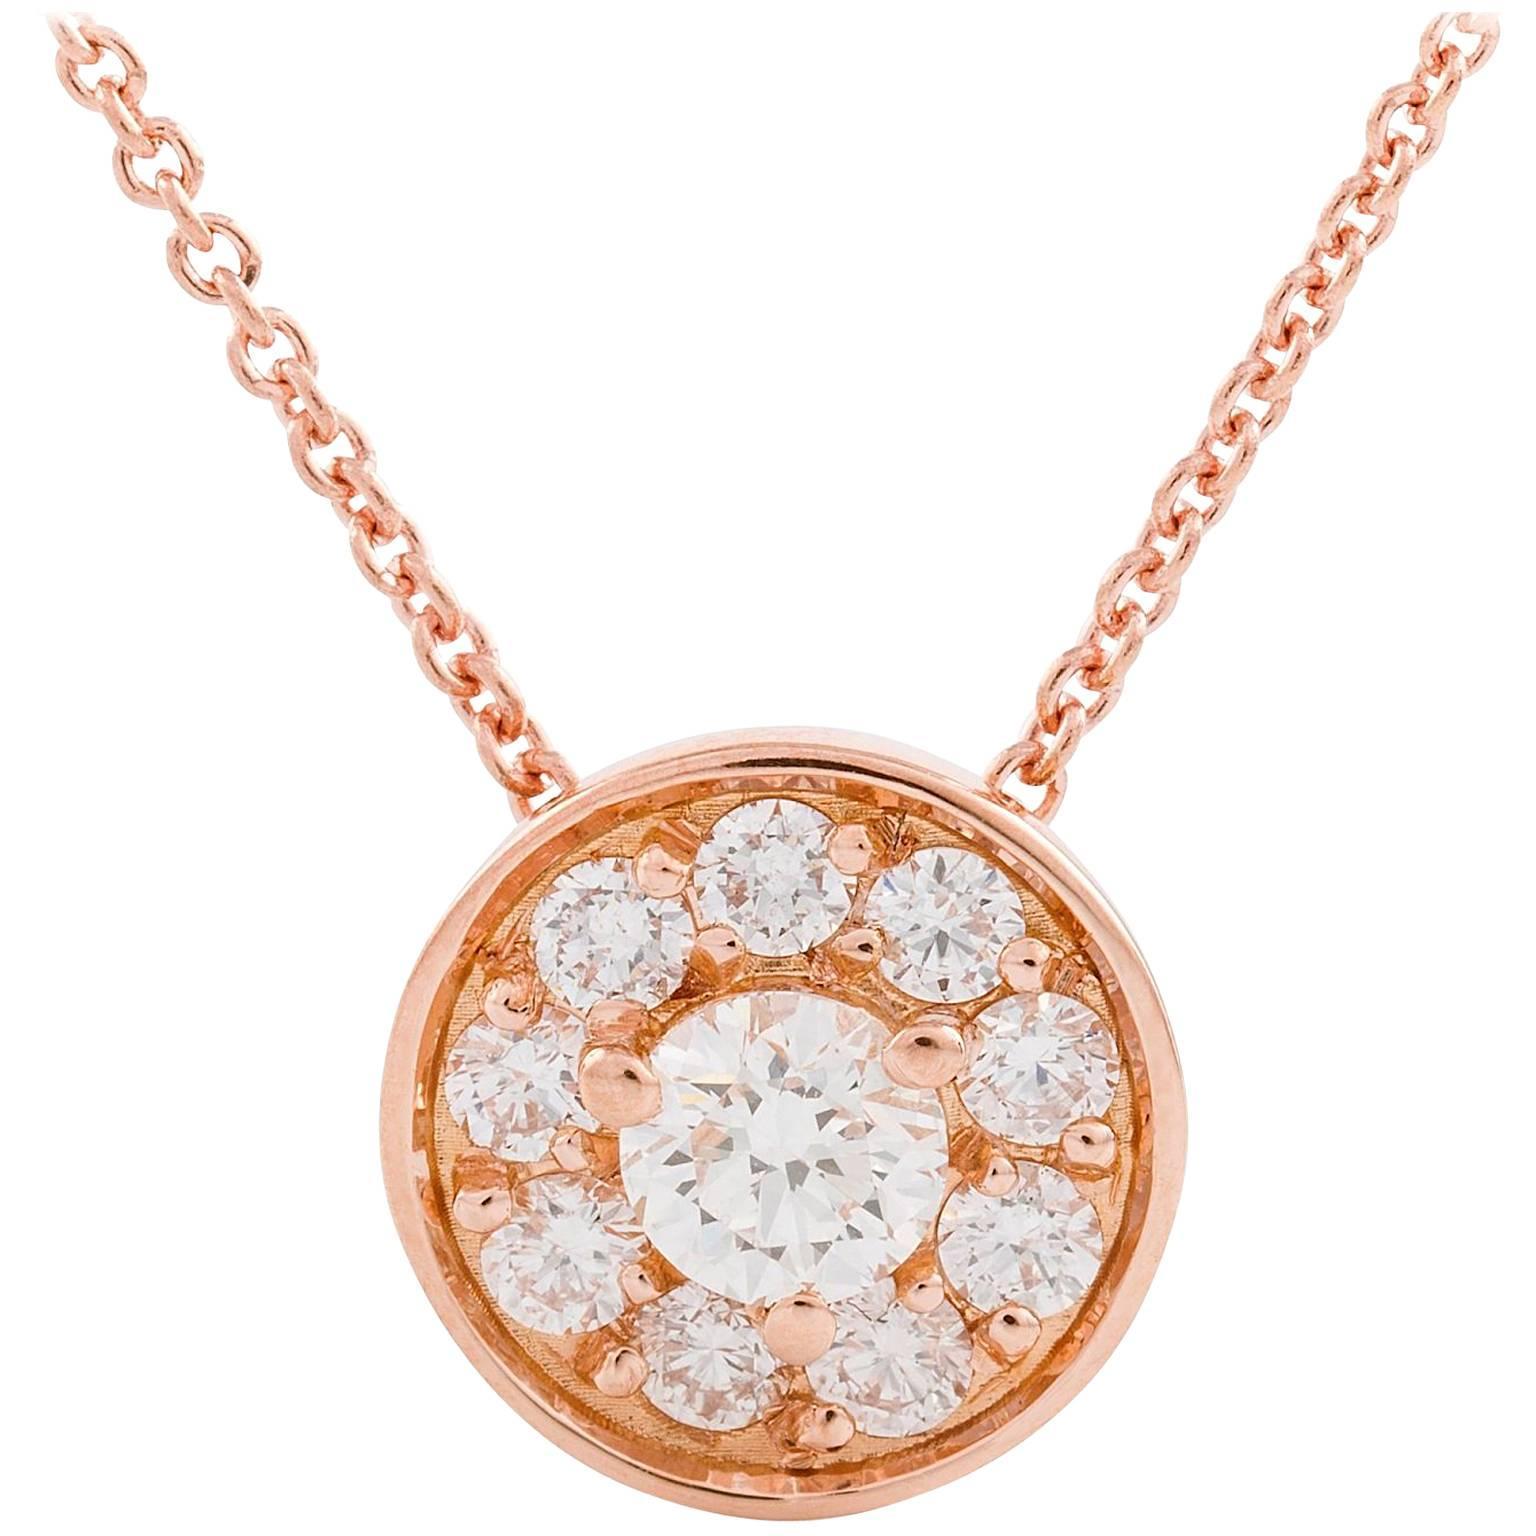 Kian Design 18 Carat Rose Gold Round Brilliant cut Halo Diamond Necklace